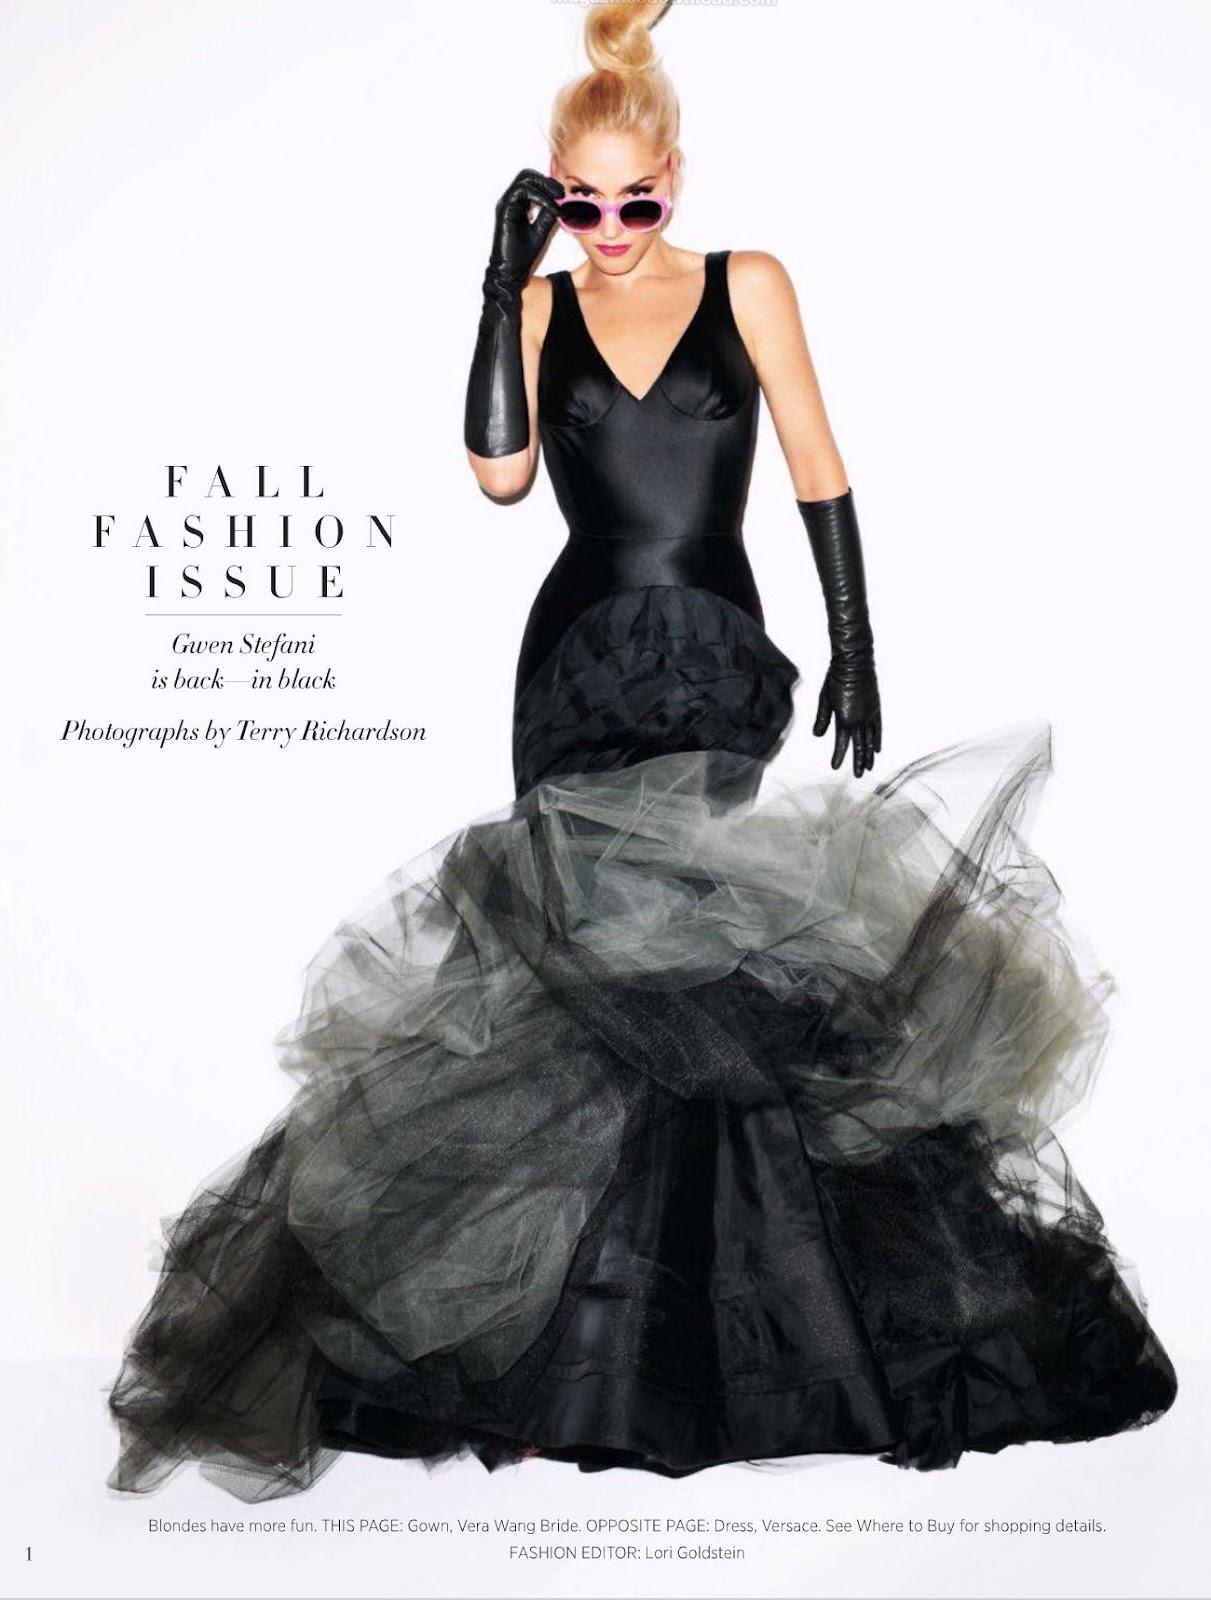 http://2.bp.blogspot.com/-CcdLgPGA6TM/UDajI2PeUaI/AAAAAAAANC8/Z-Ub6WOUotY/s1600/Gwen+Stefani++Harper%27s+Bazaar+USA+++Sept+2012.jpg